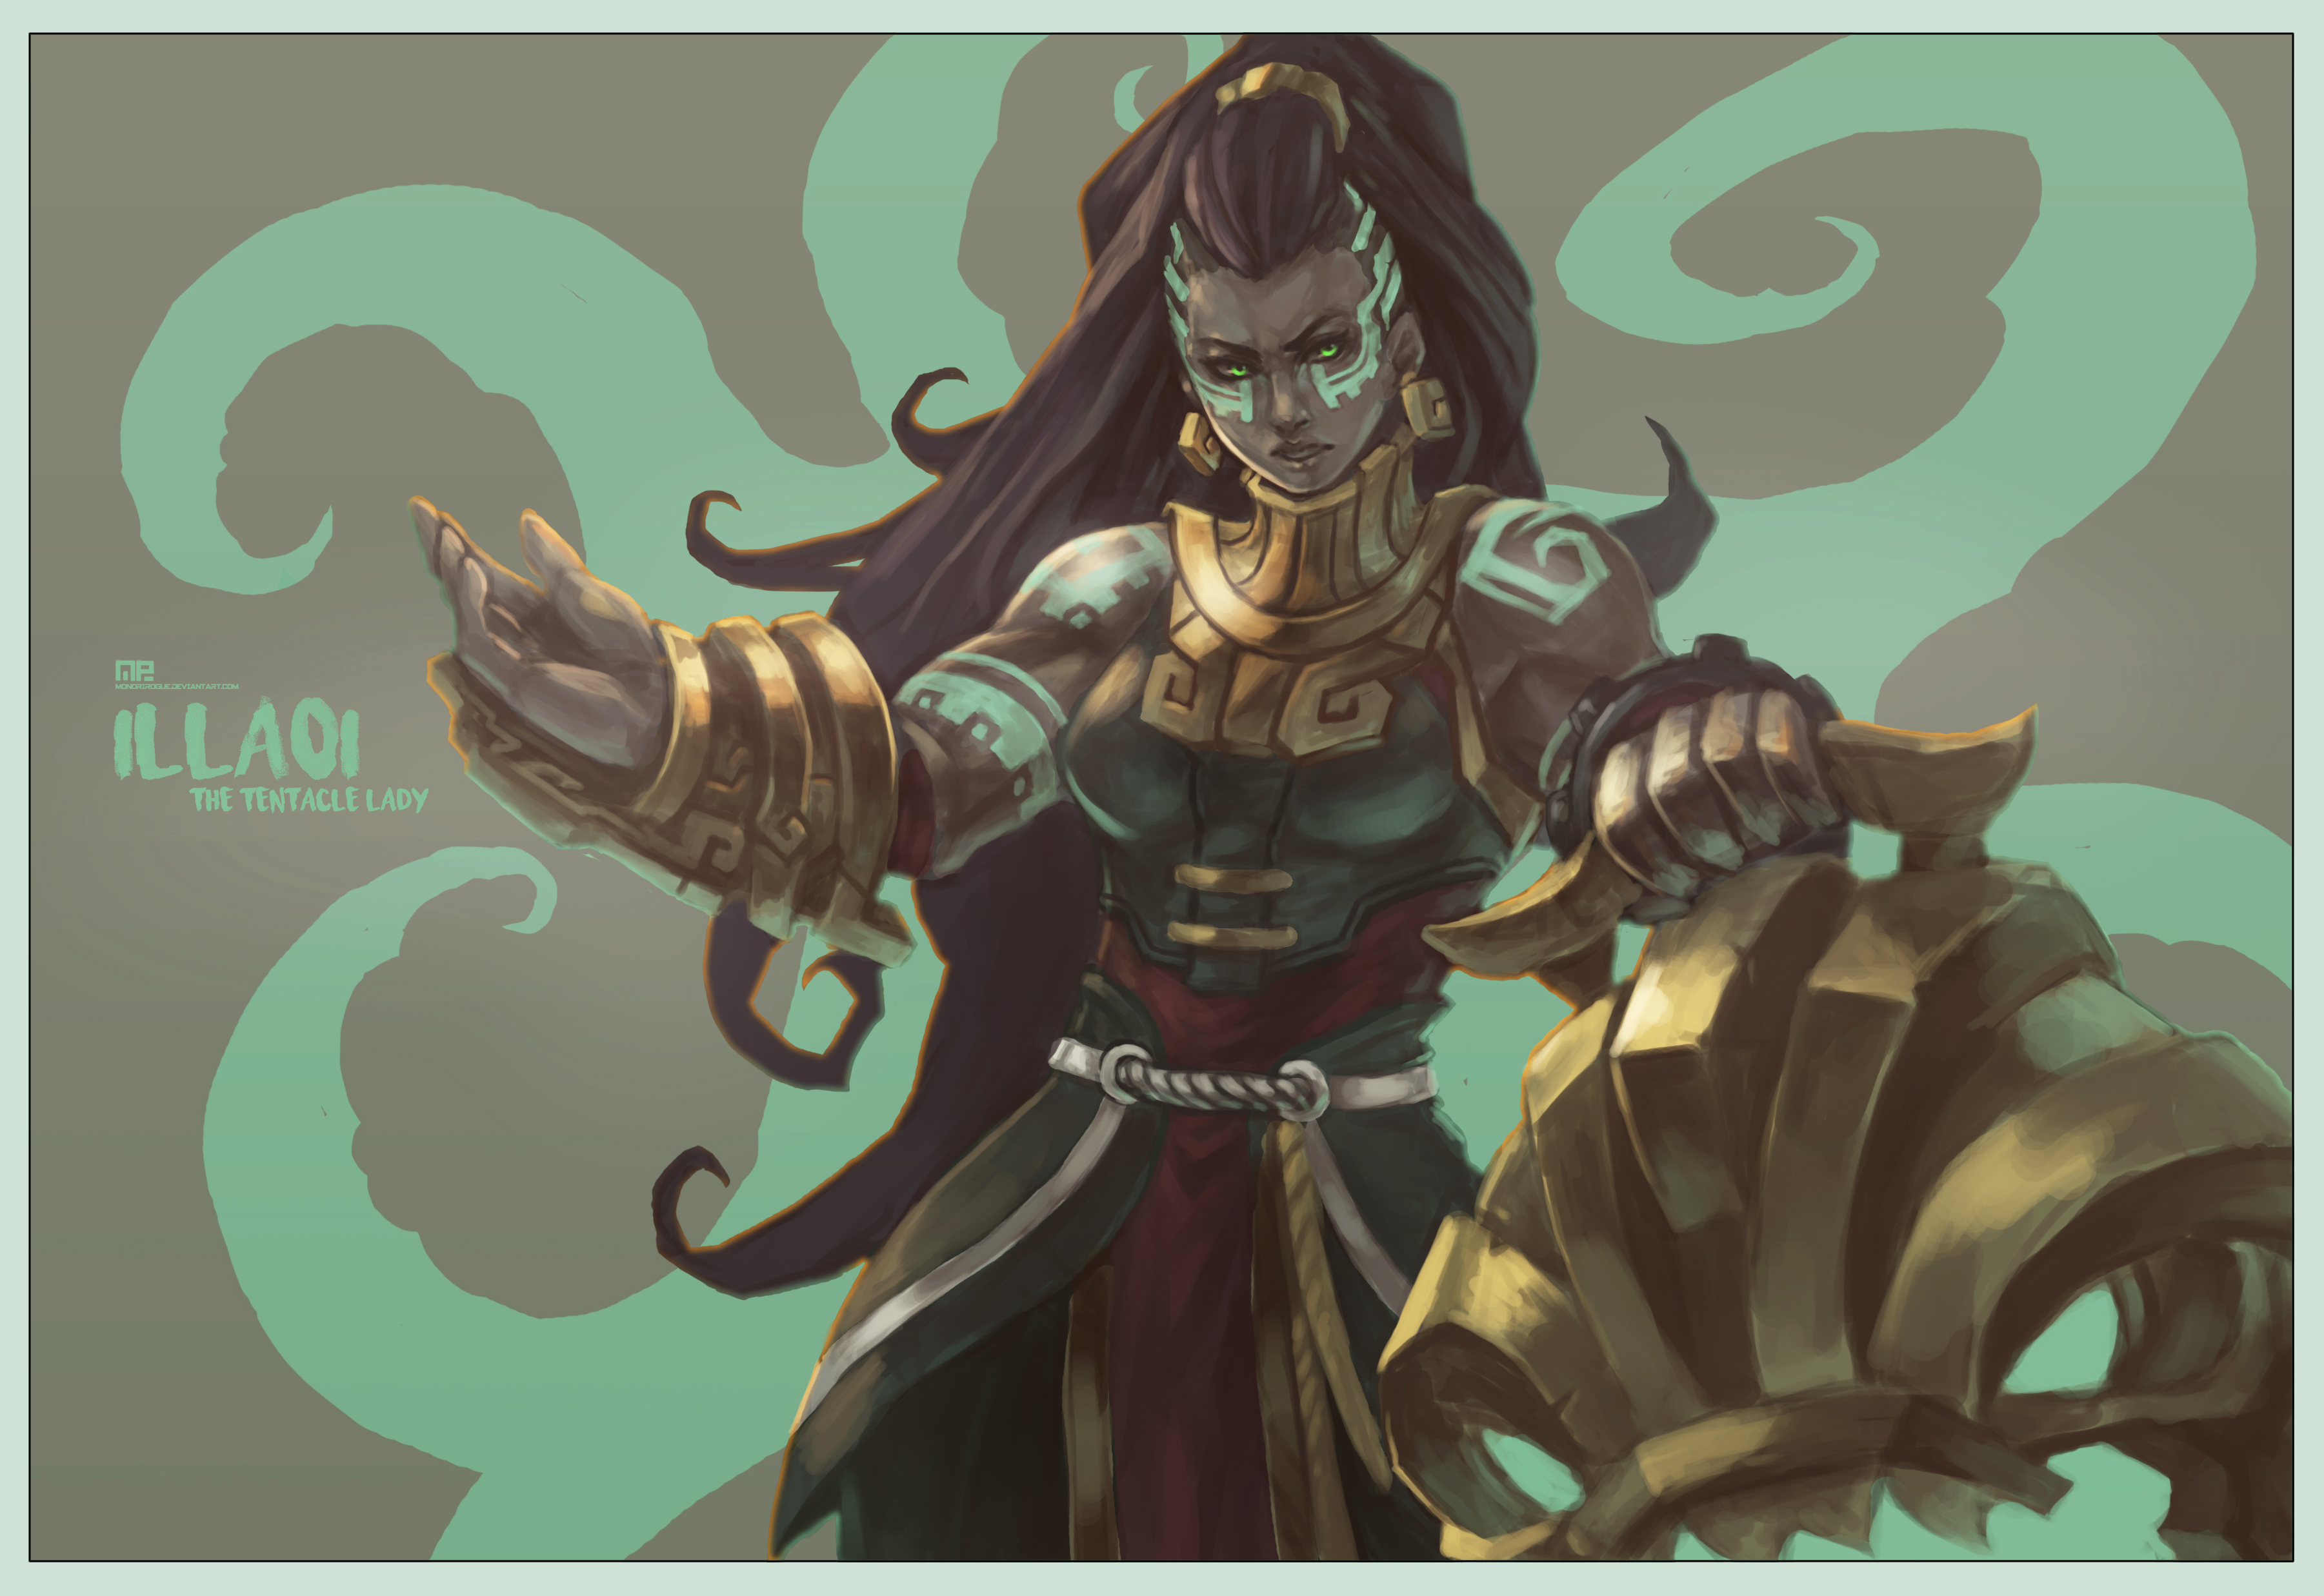 illaoi league of legends drawn by monori rogue danbooru